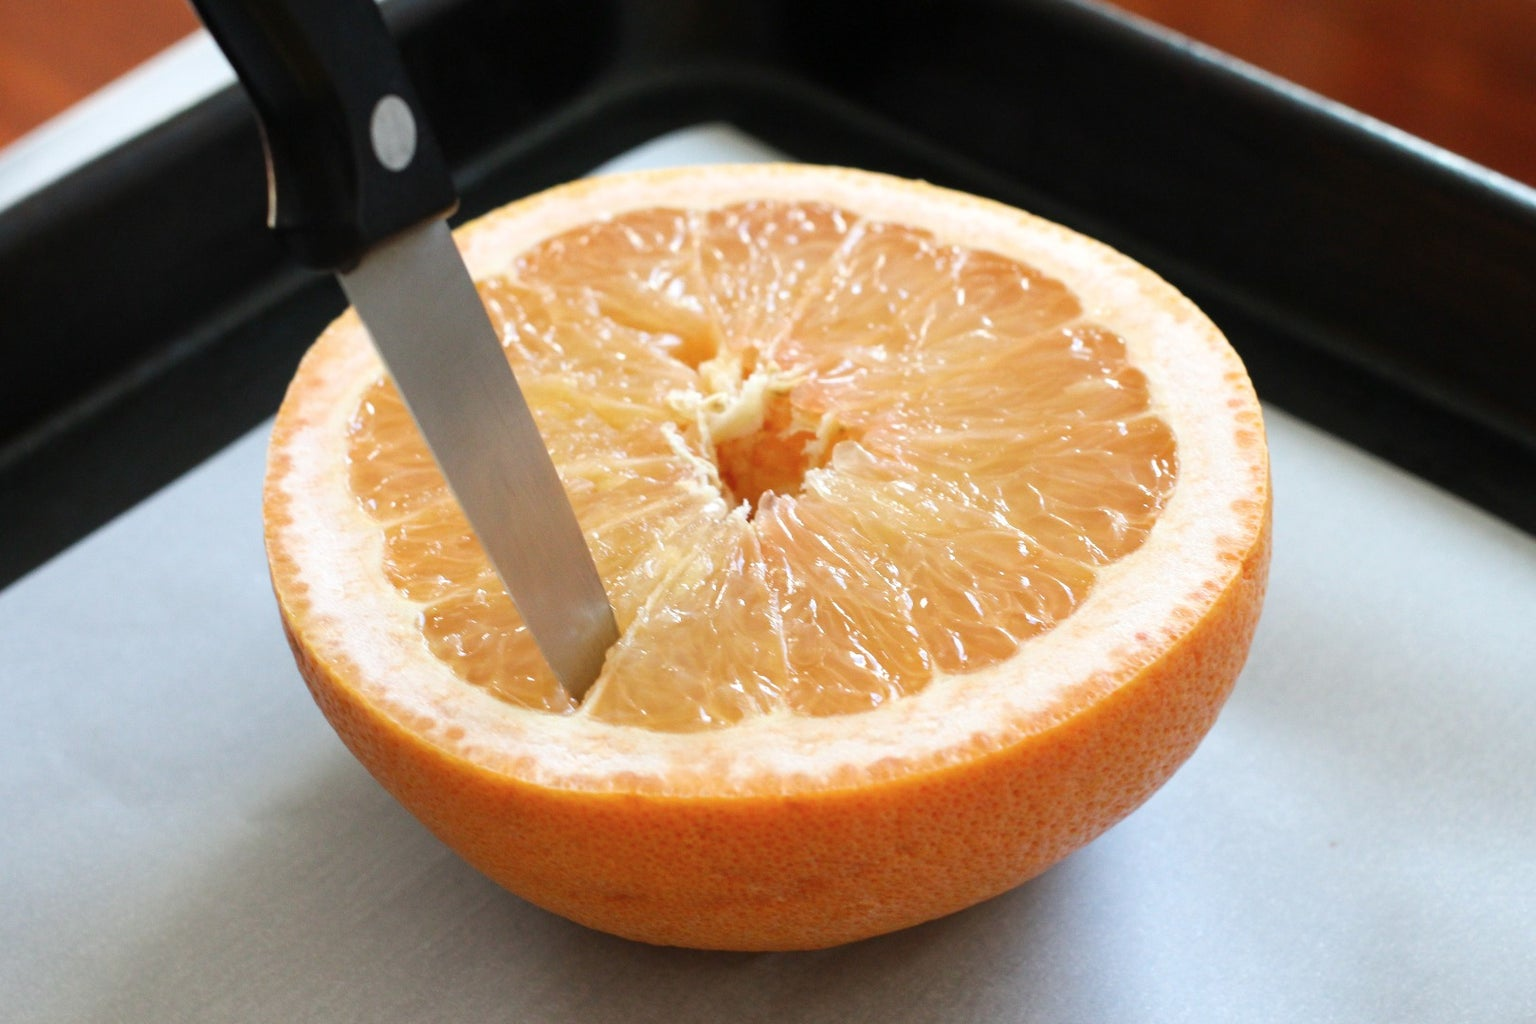 Cut the Grapefruit in Half and Prep It